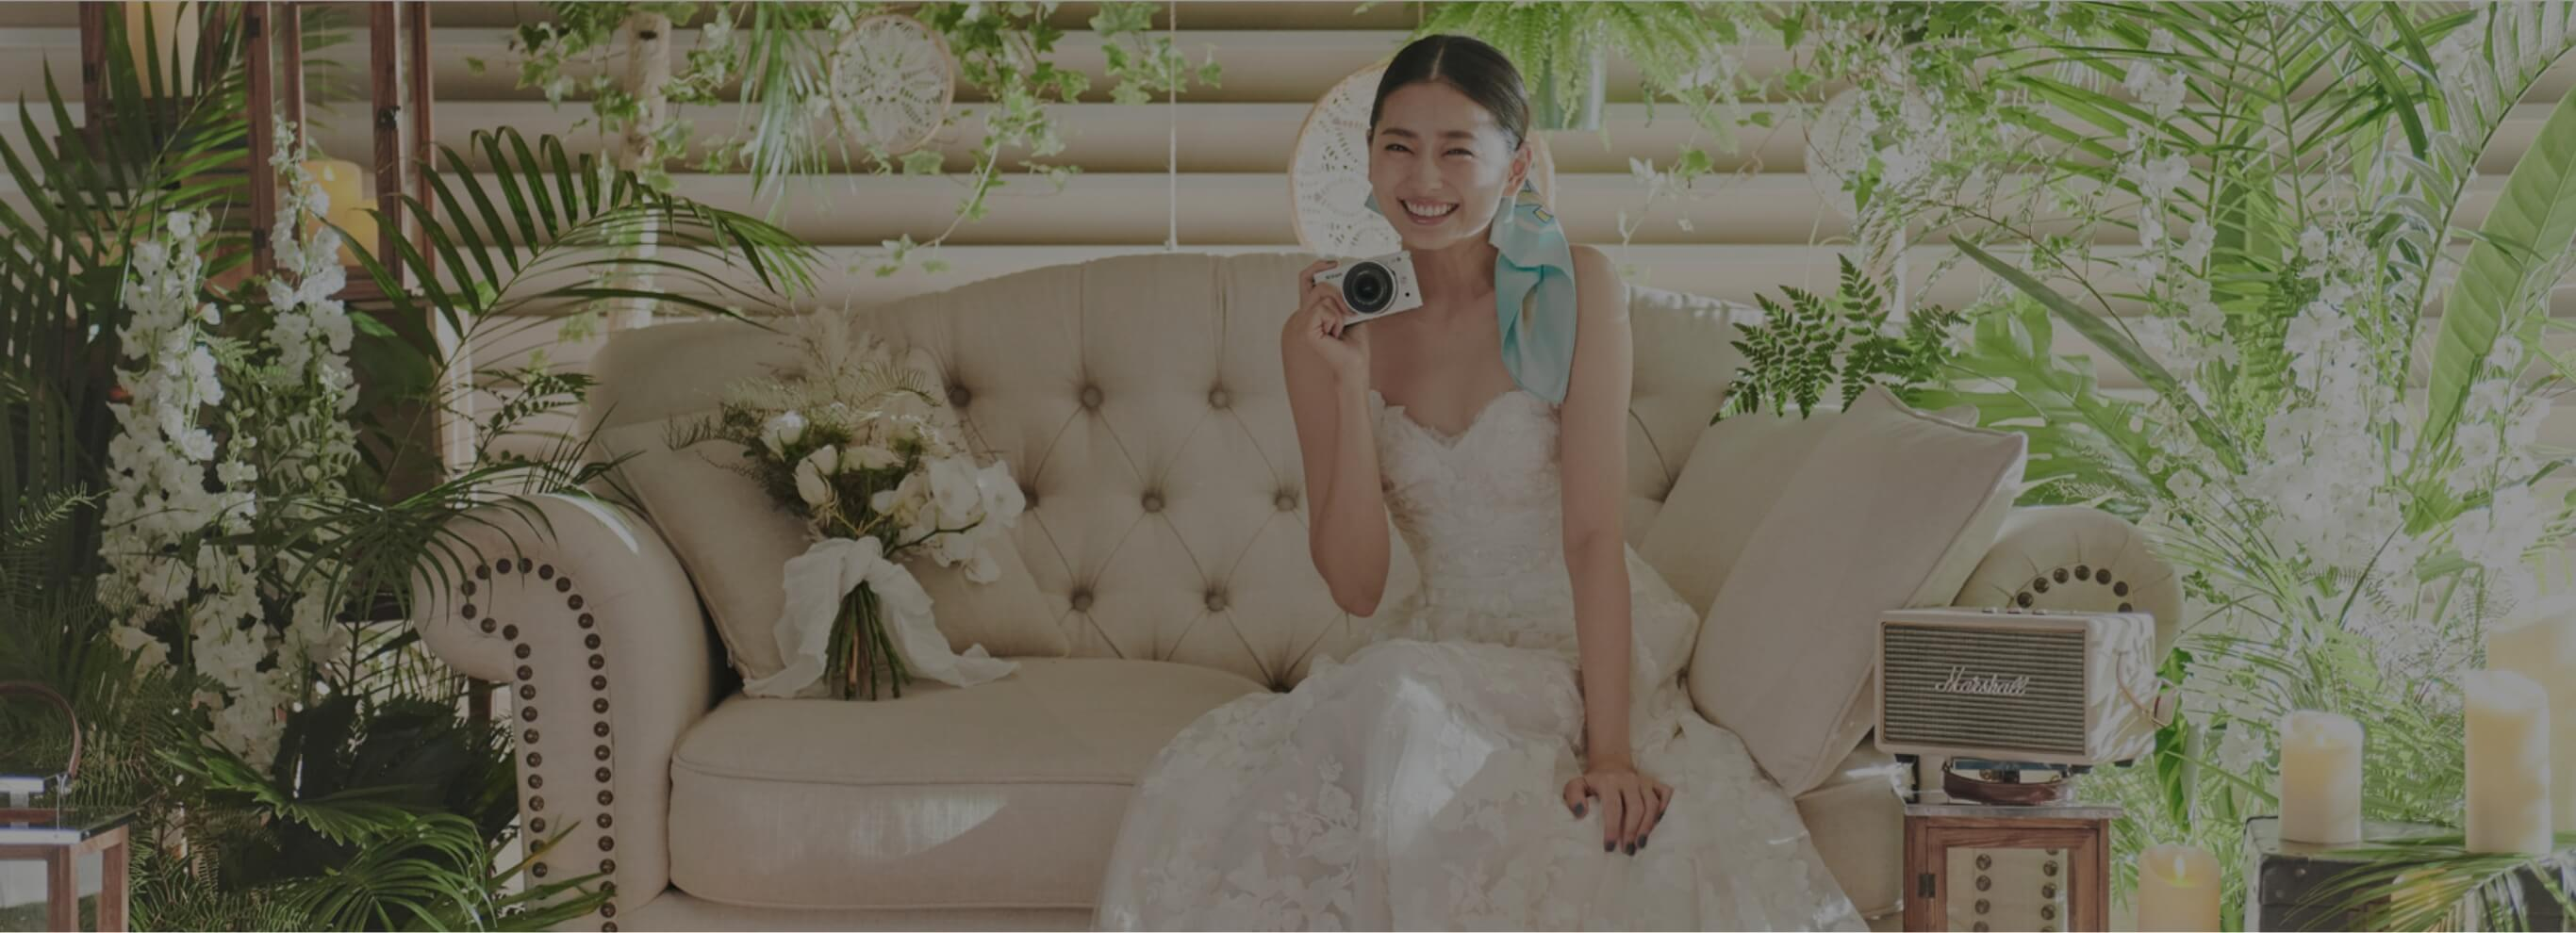 onlinewedding